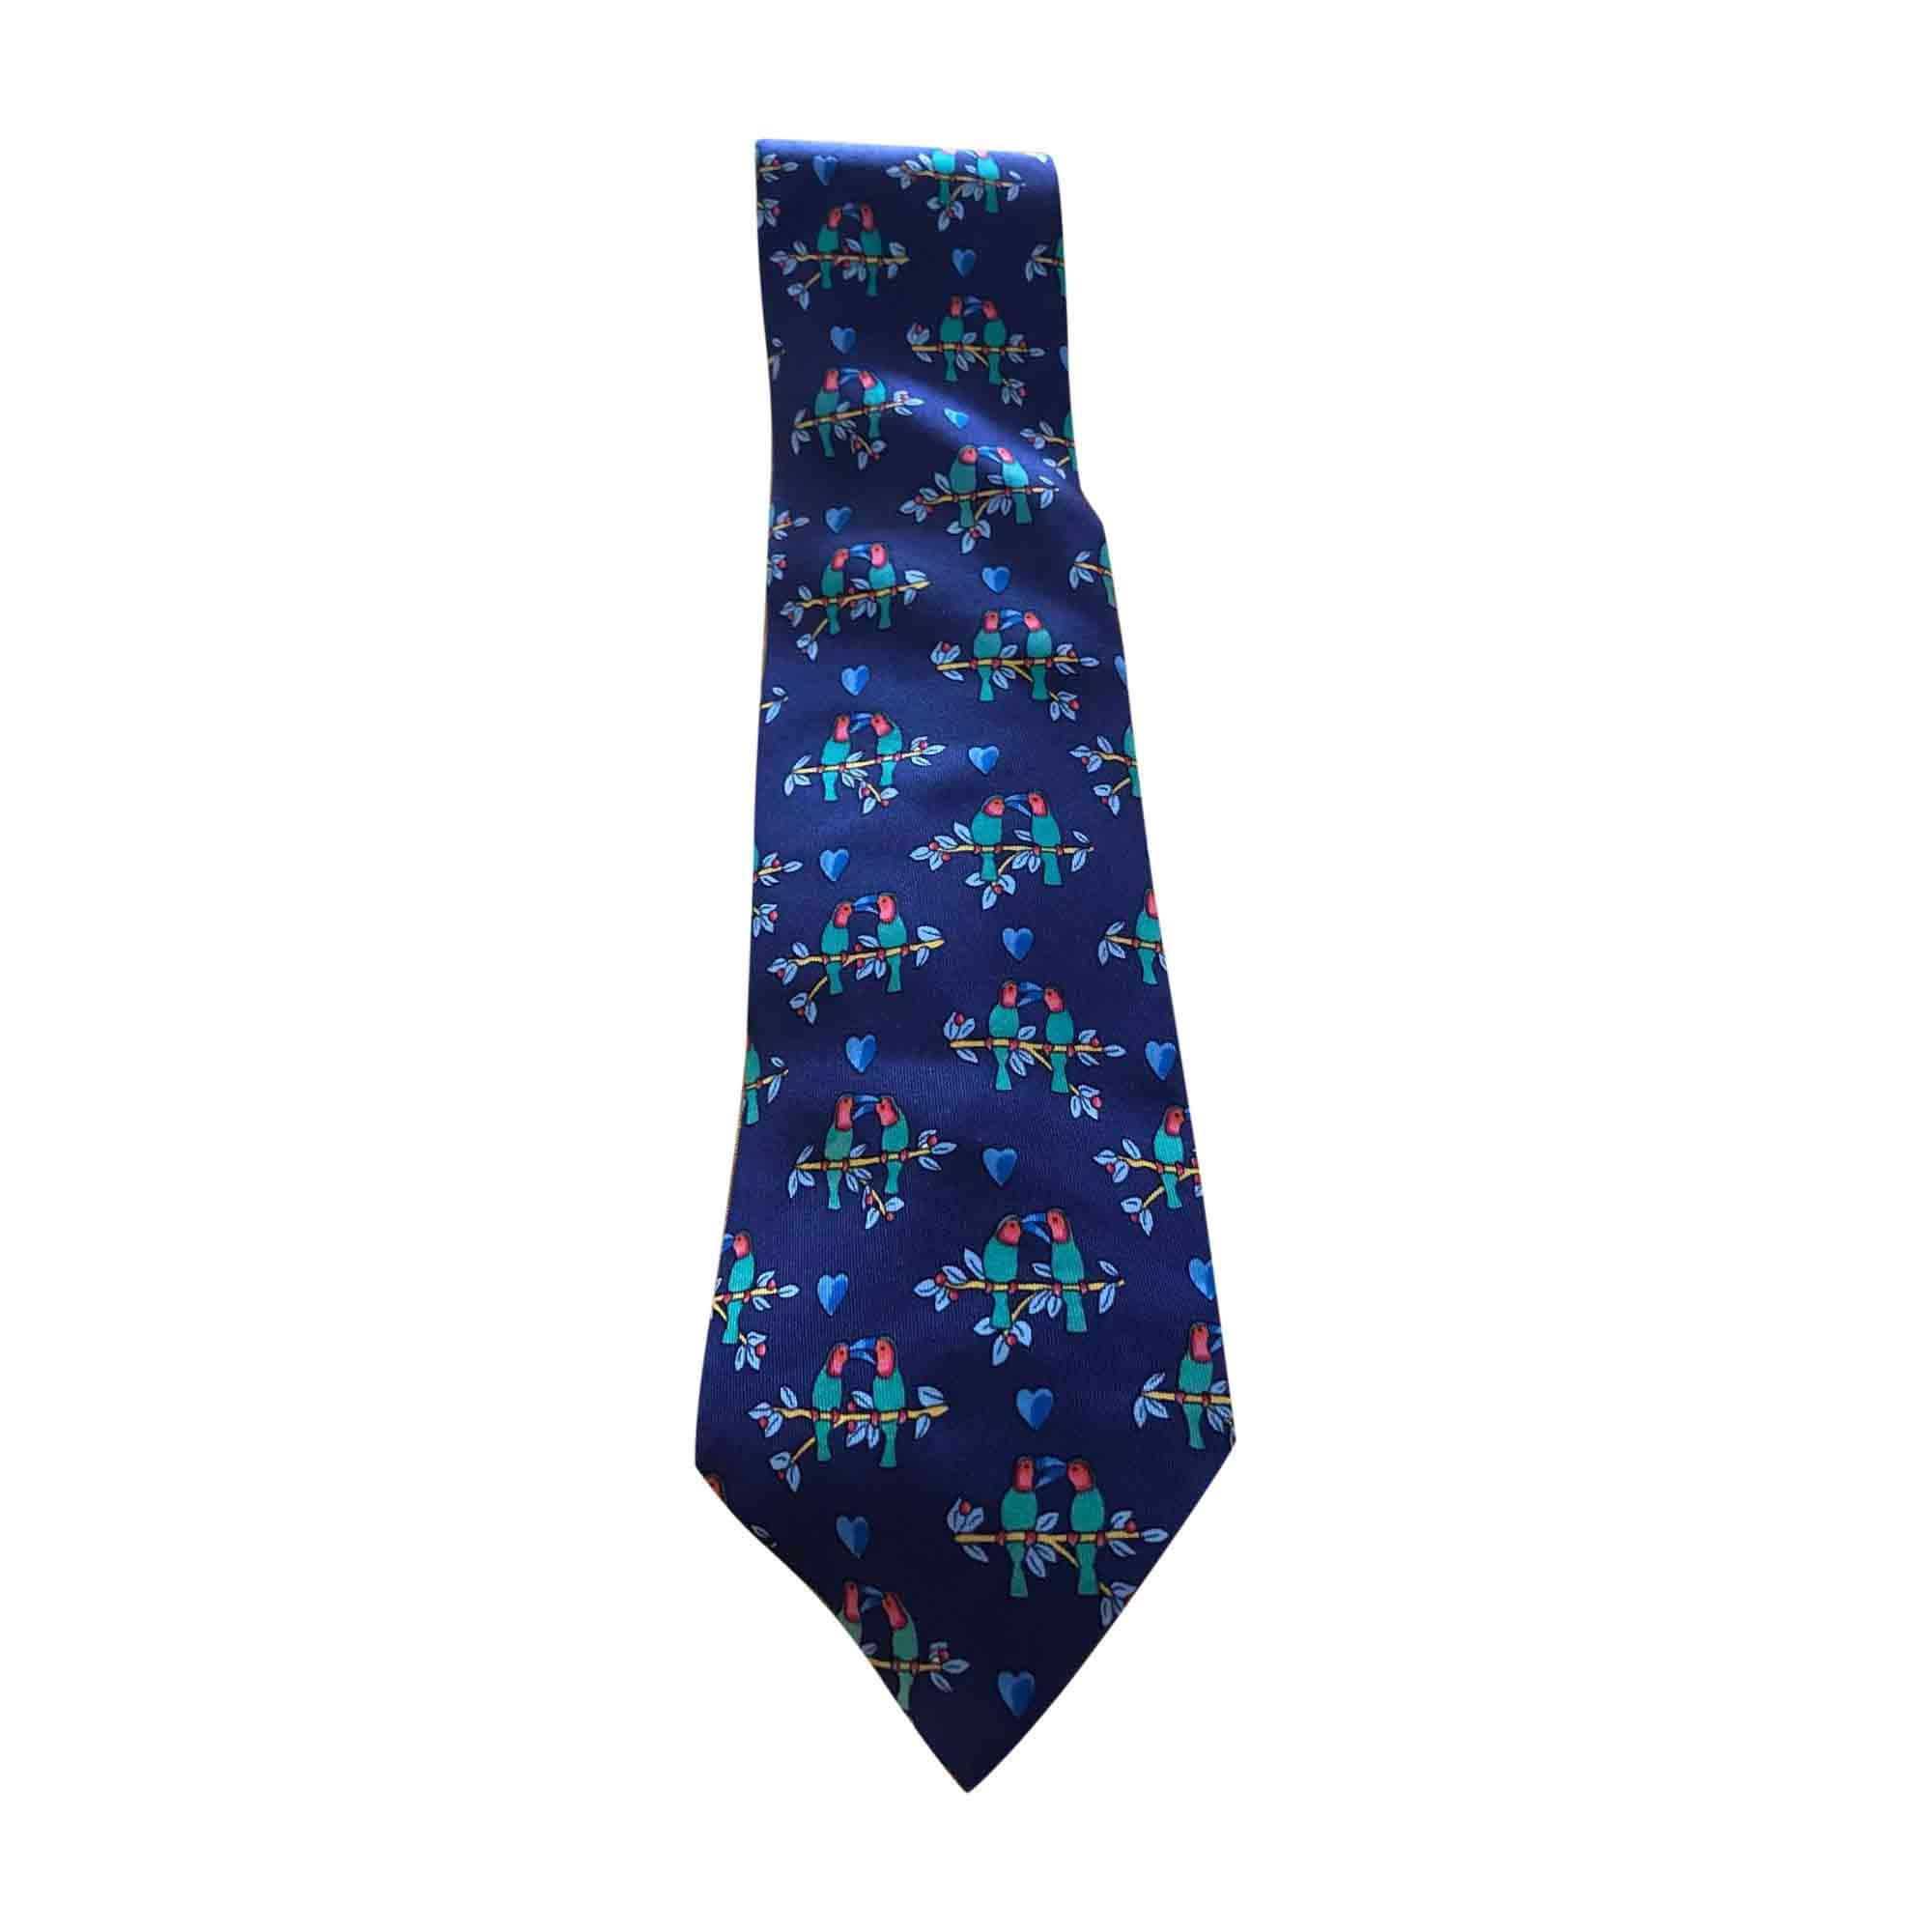 Cravate HERMÈS Bleu, bleu marine, bleu turquoise